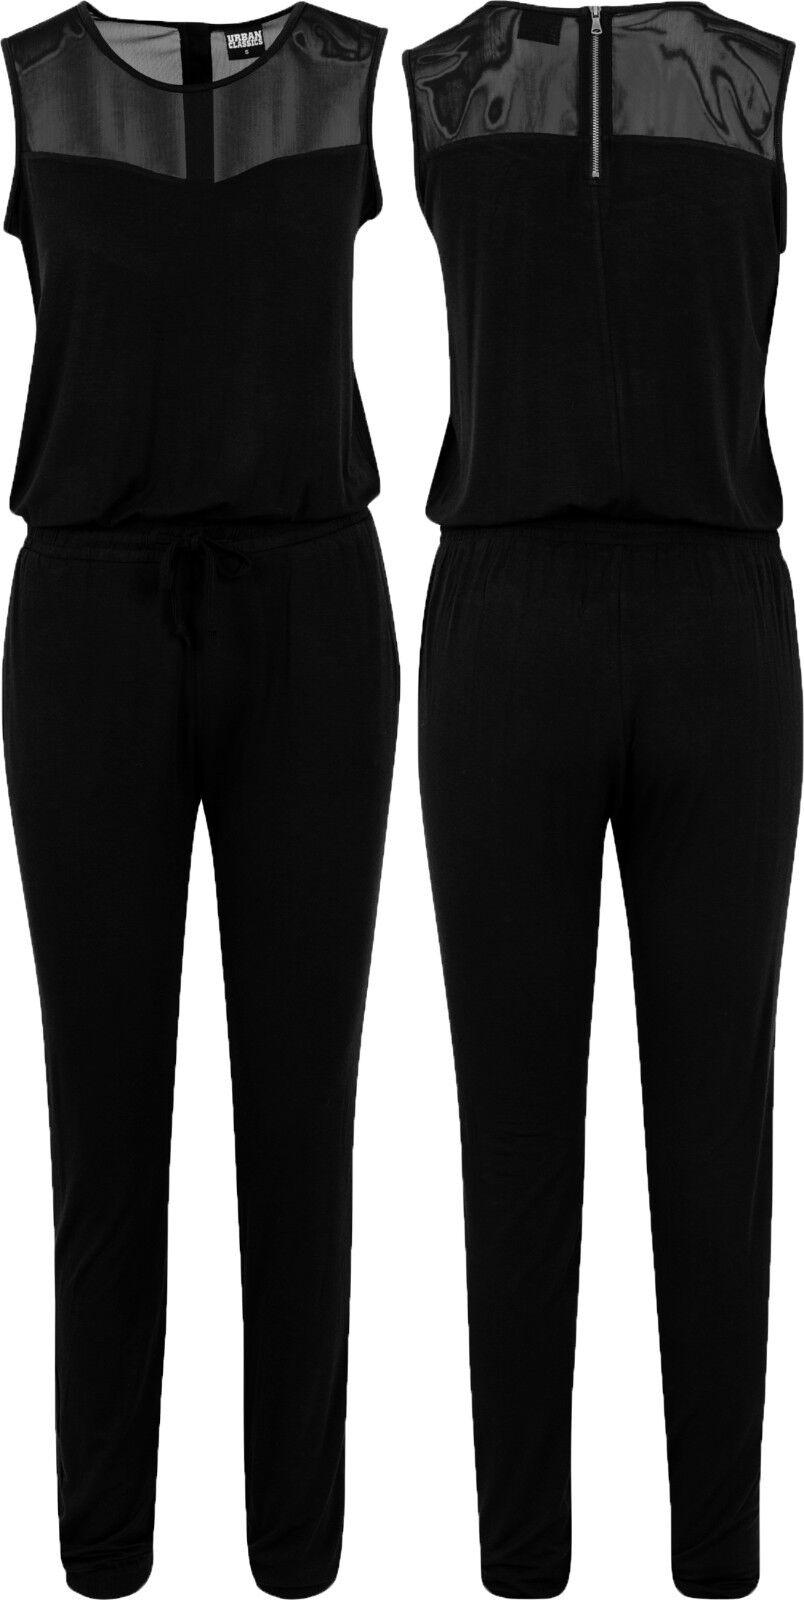 urban classics damen overall jumpsuit einteiler lang damen overall schwarz 1630 ebay. Black Bedroom Furniture Sets. Home Design Ideas